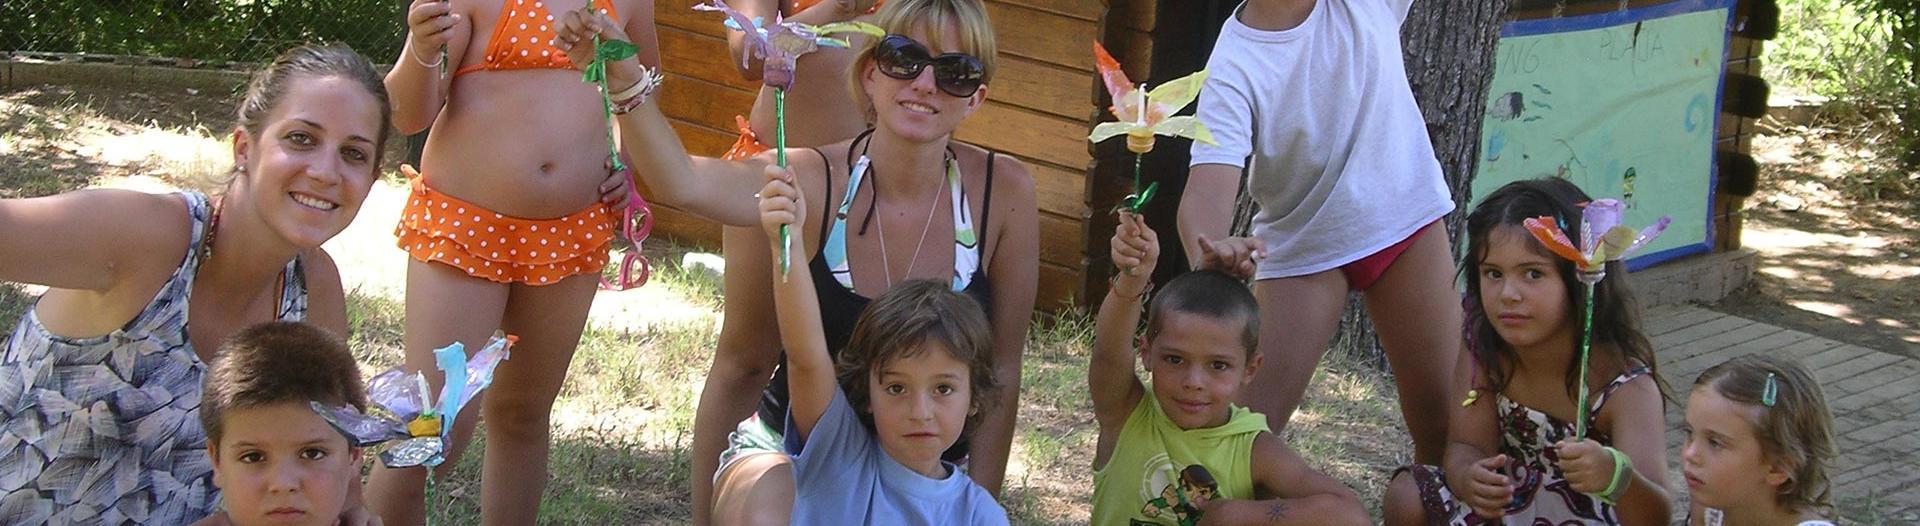 slider-camping-alqueria-club-enfants-valencia